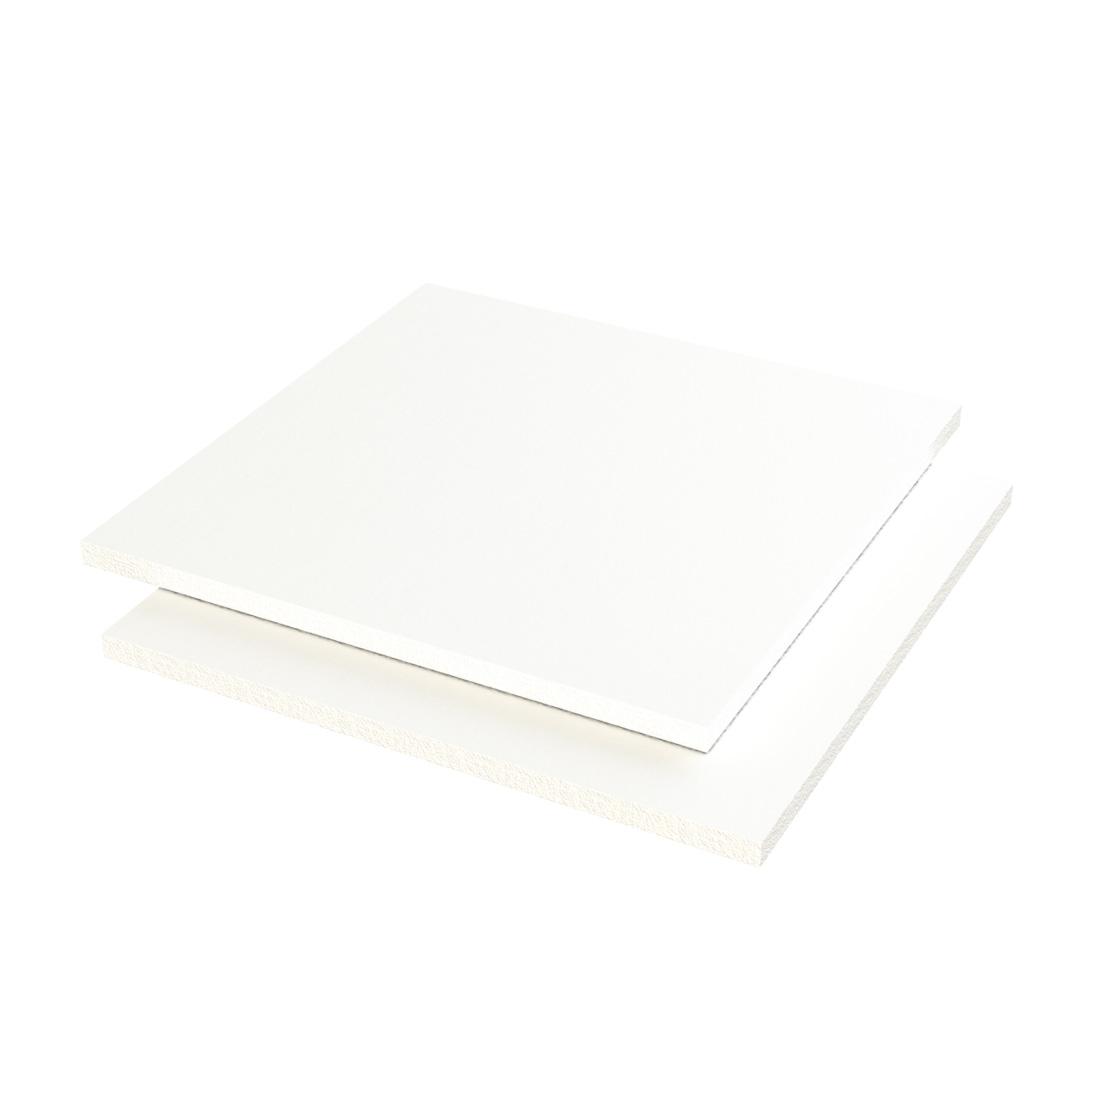 Vikupor print PVC Plaat Geschuimd Wit Enkelzijdig folie 3050x1560x10mm